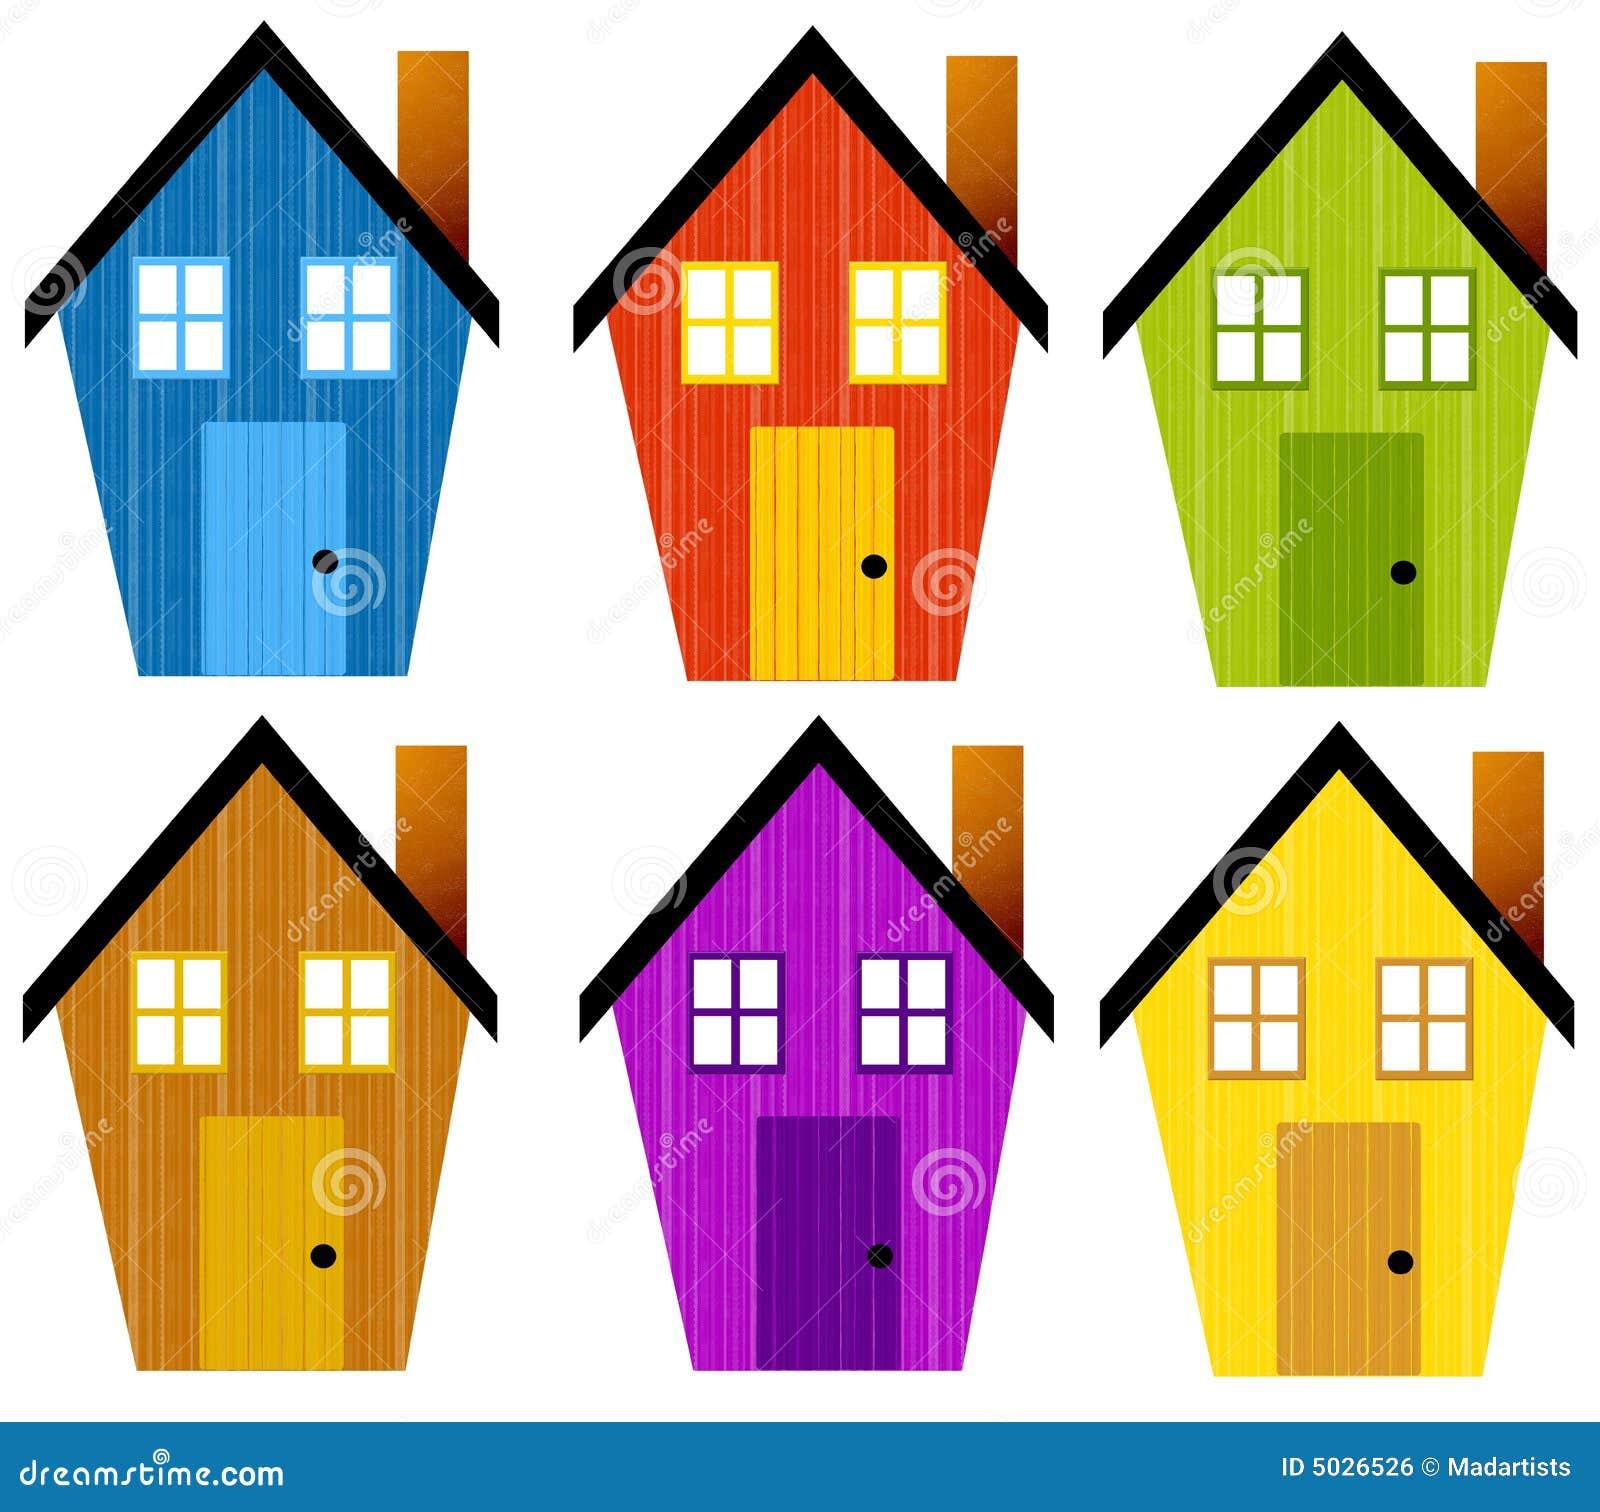 Artsy Rustic Clip Art Houses Stock Illustration ...